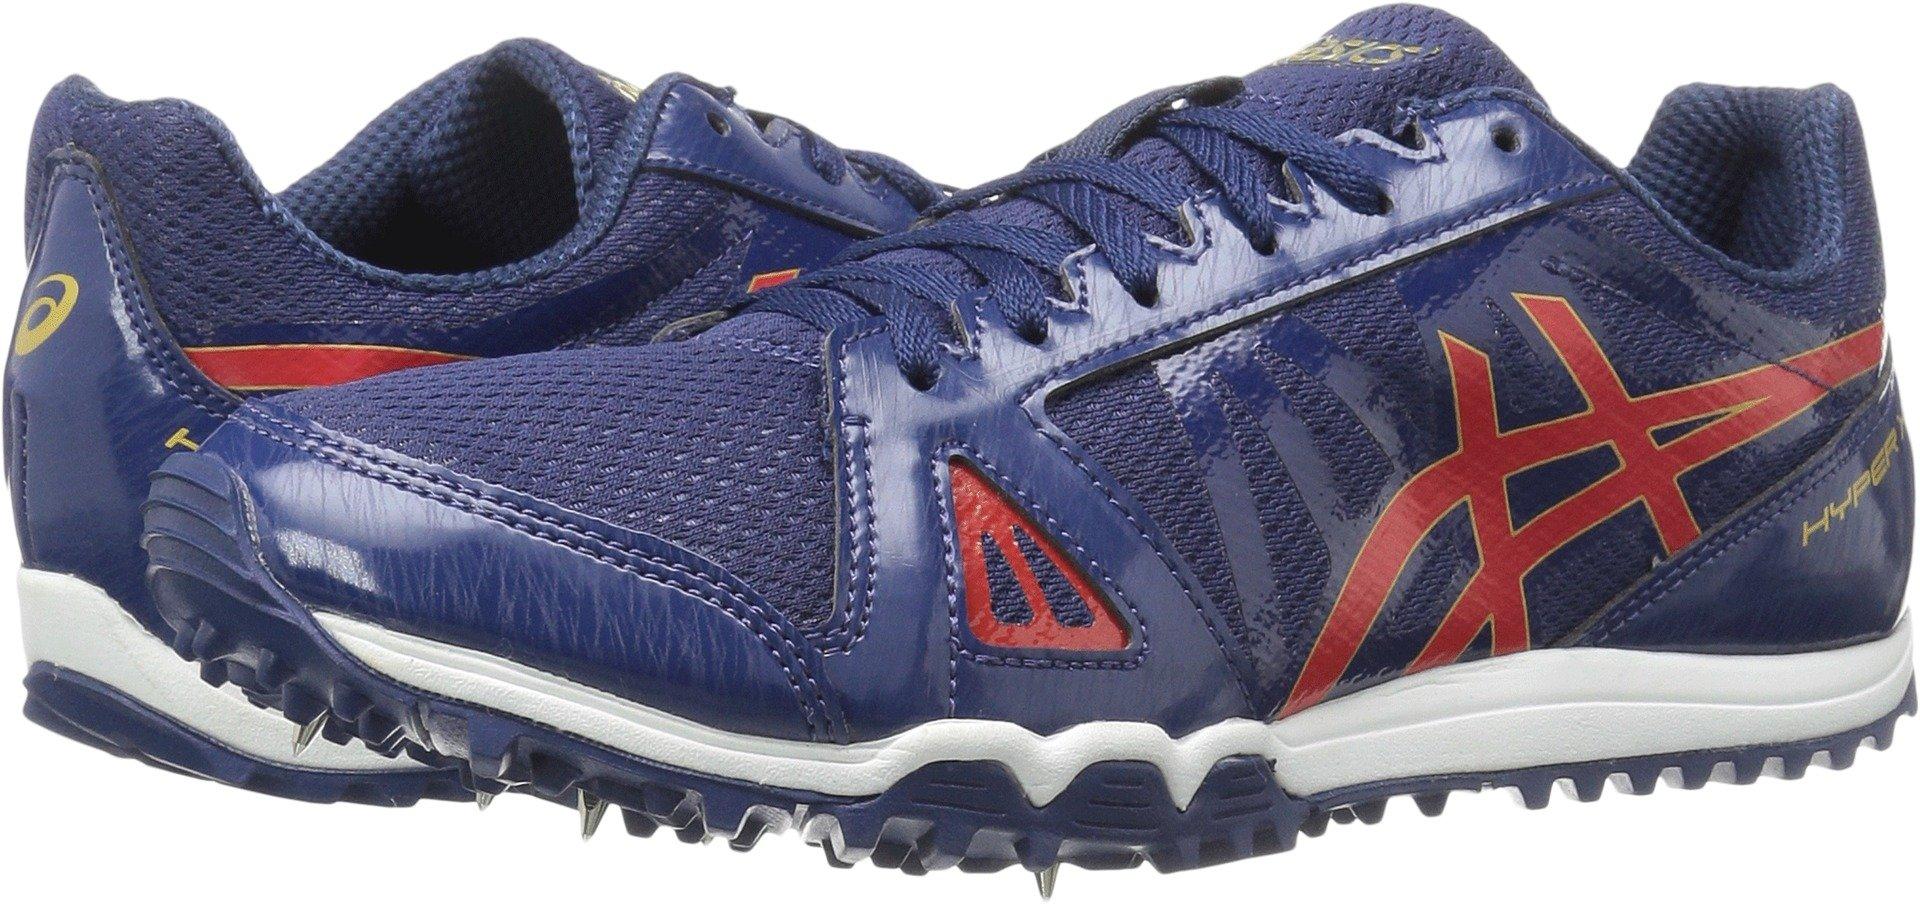 ASICS Men's Hyper XC Cross-Country Running Shoe, Estate Blue/Vermilion/Rich Gold, 8.5 M US